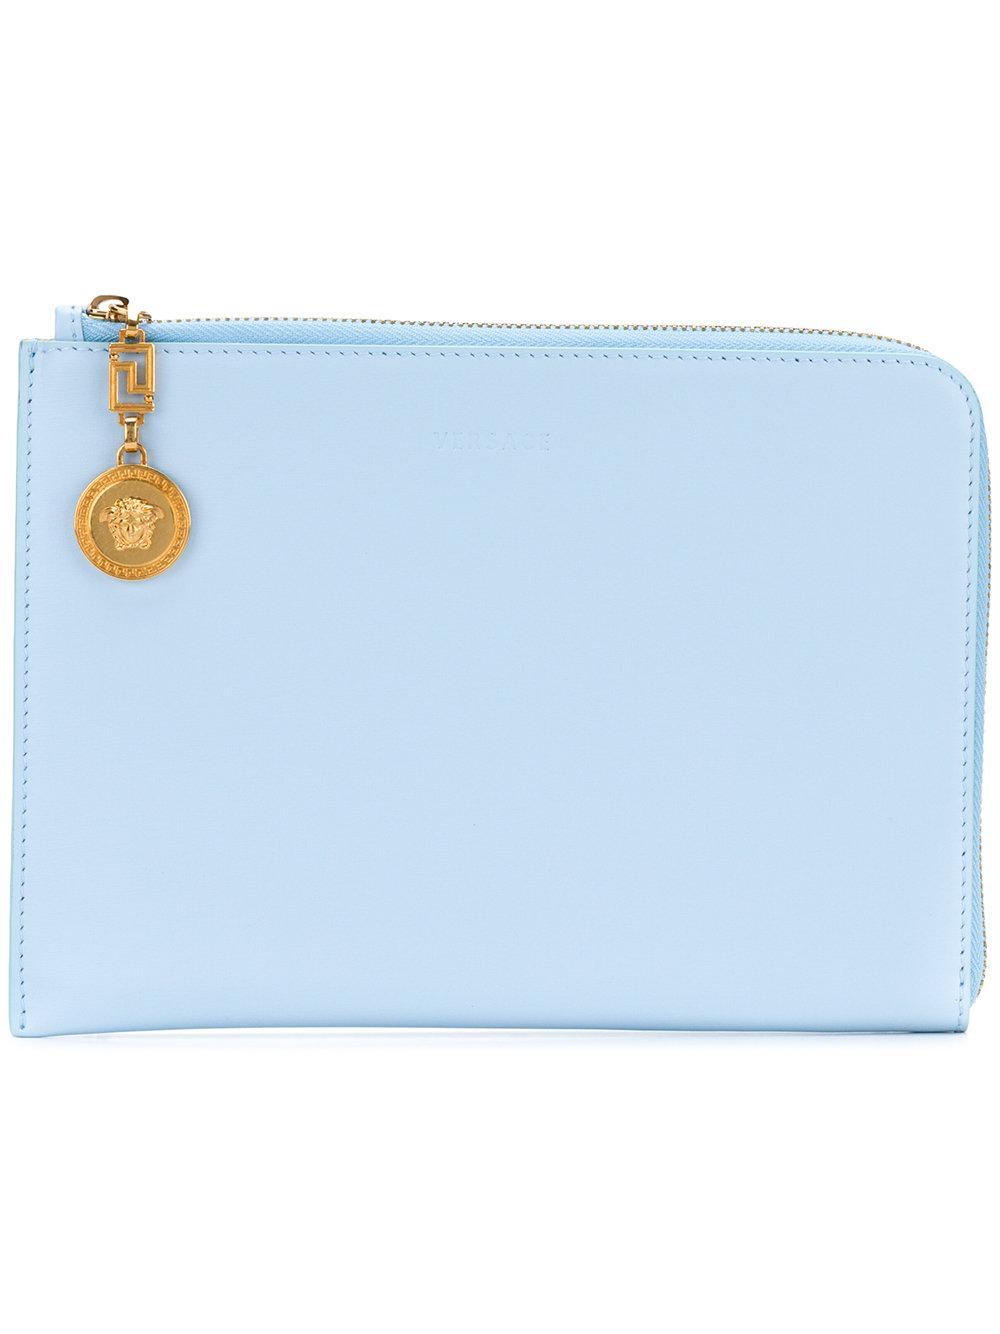 736f4336 Medusa Lock Clutch Bag